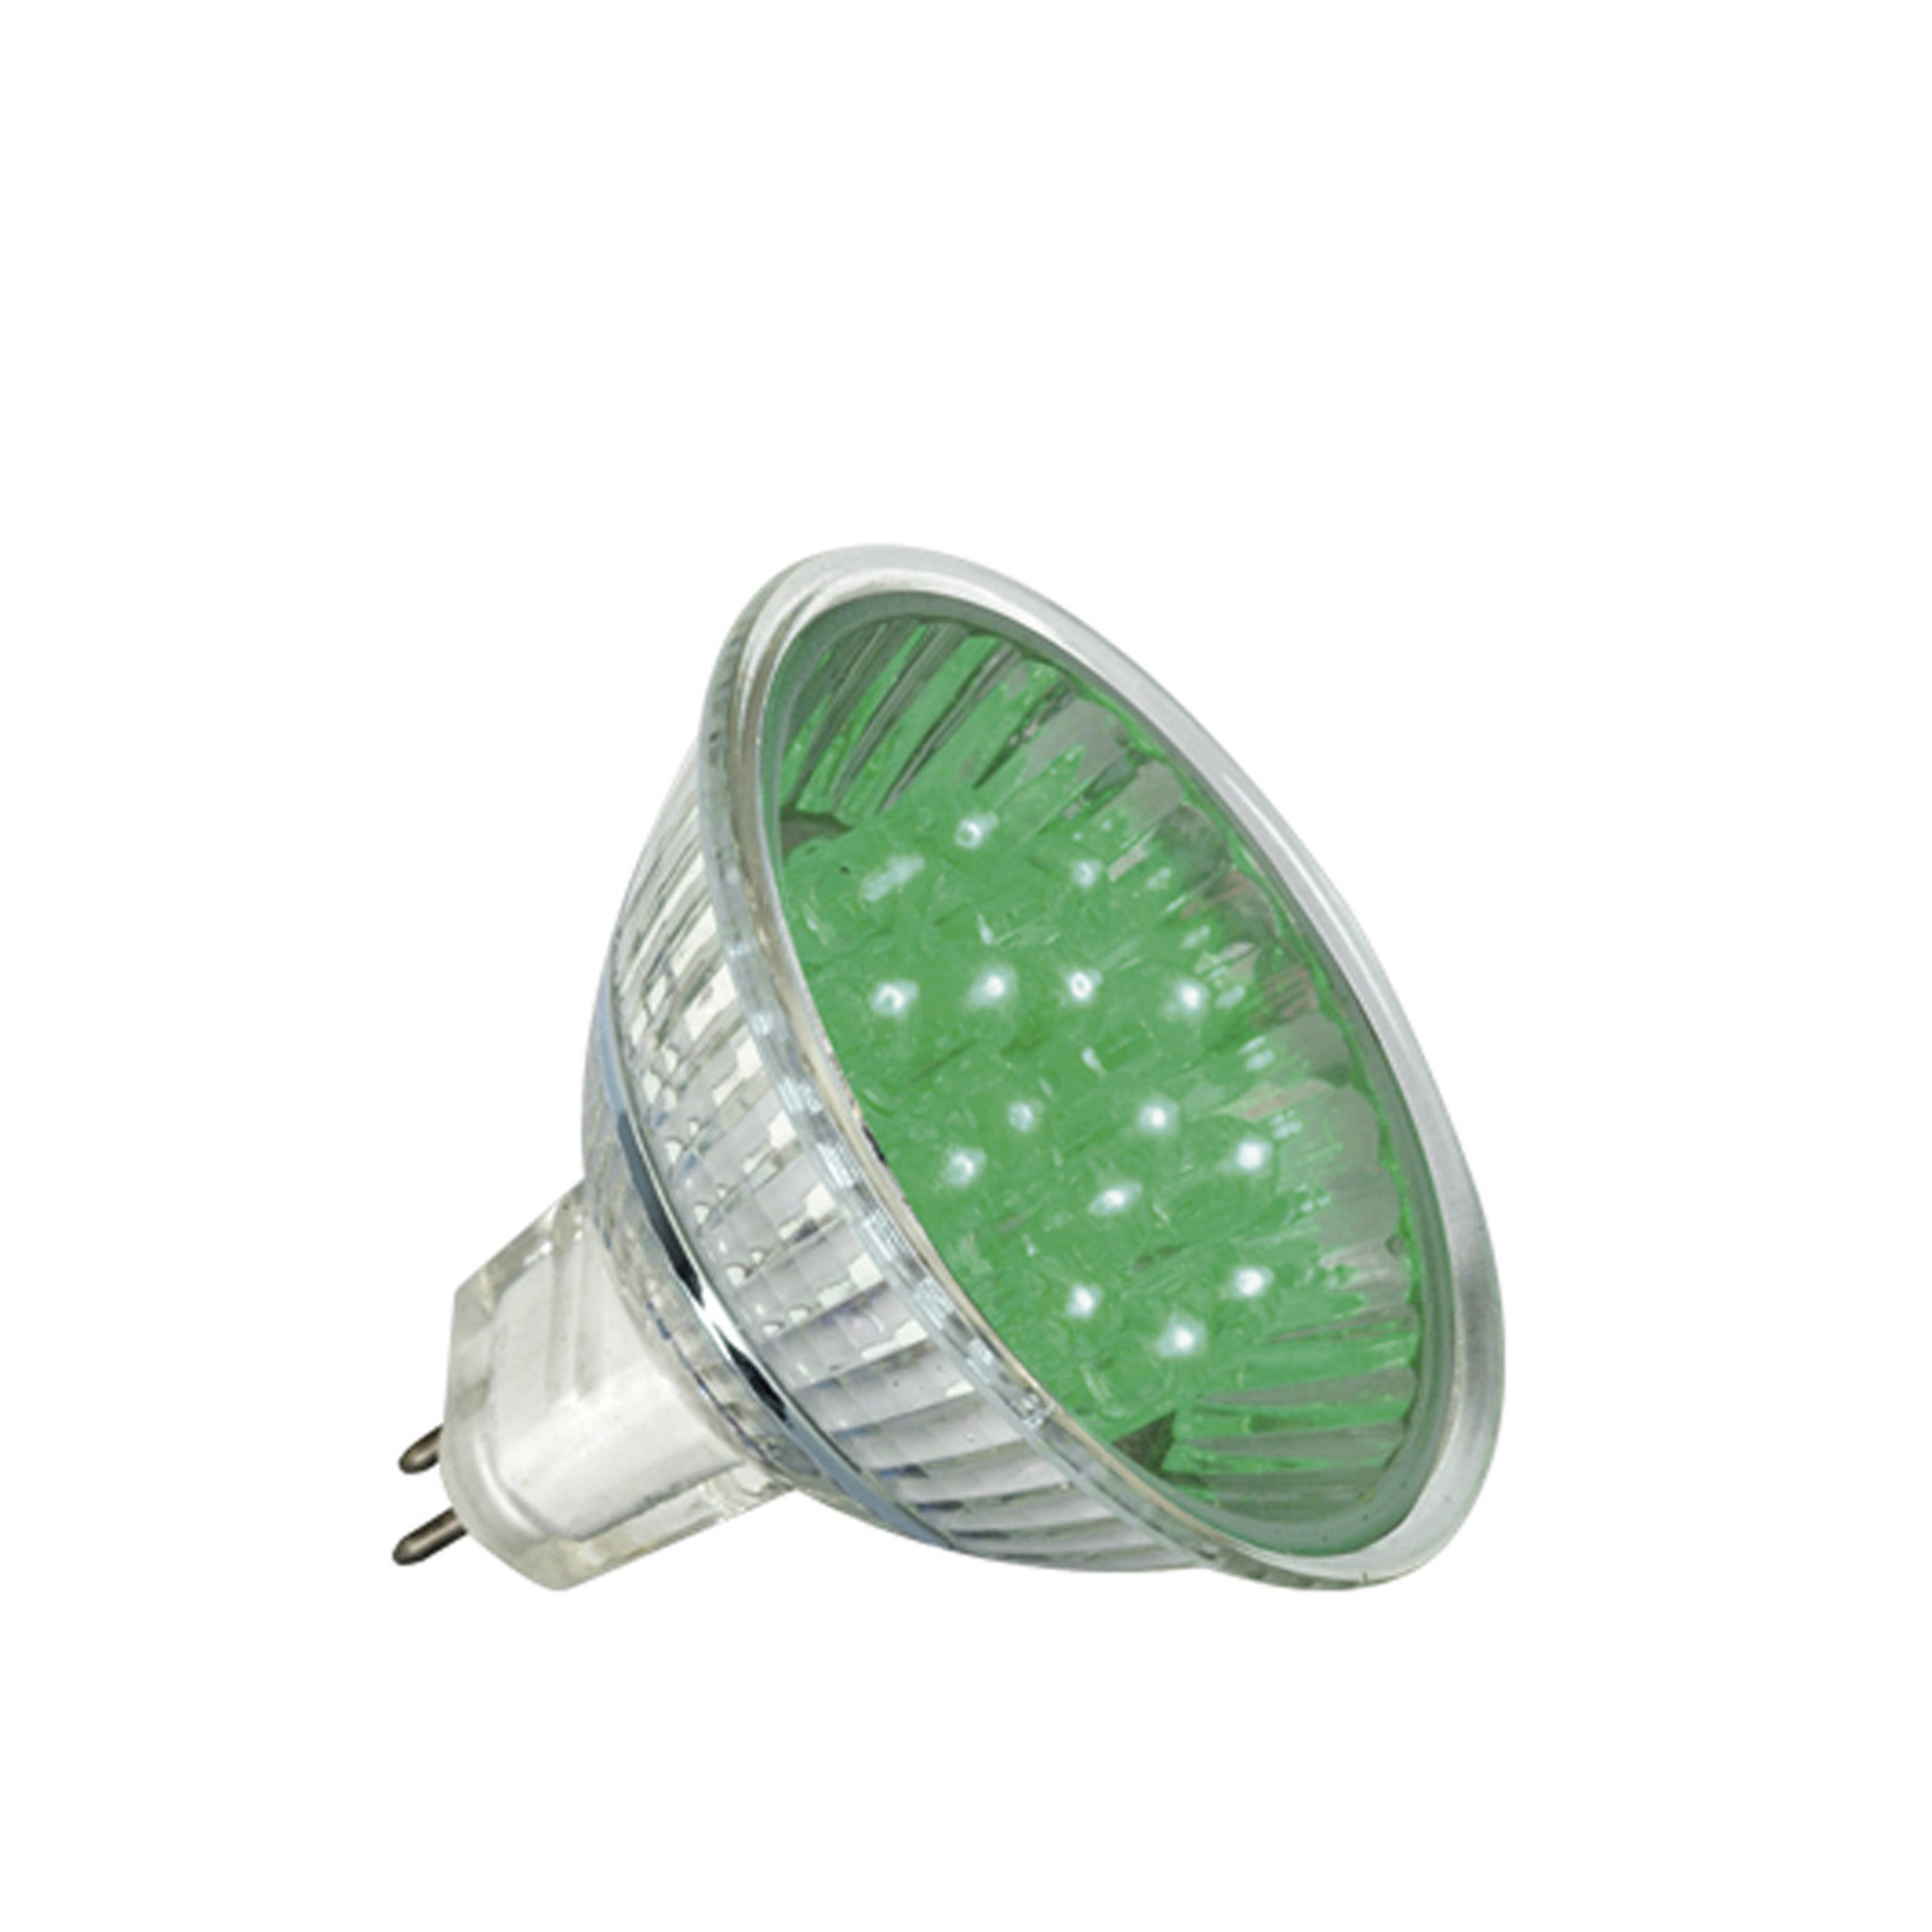 Лампа светодиодная Paulmann 28004 GU5.3 29 Лм зеленый свет